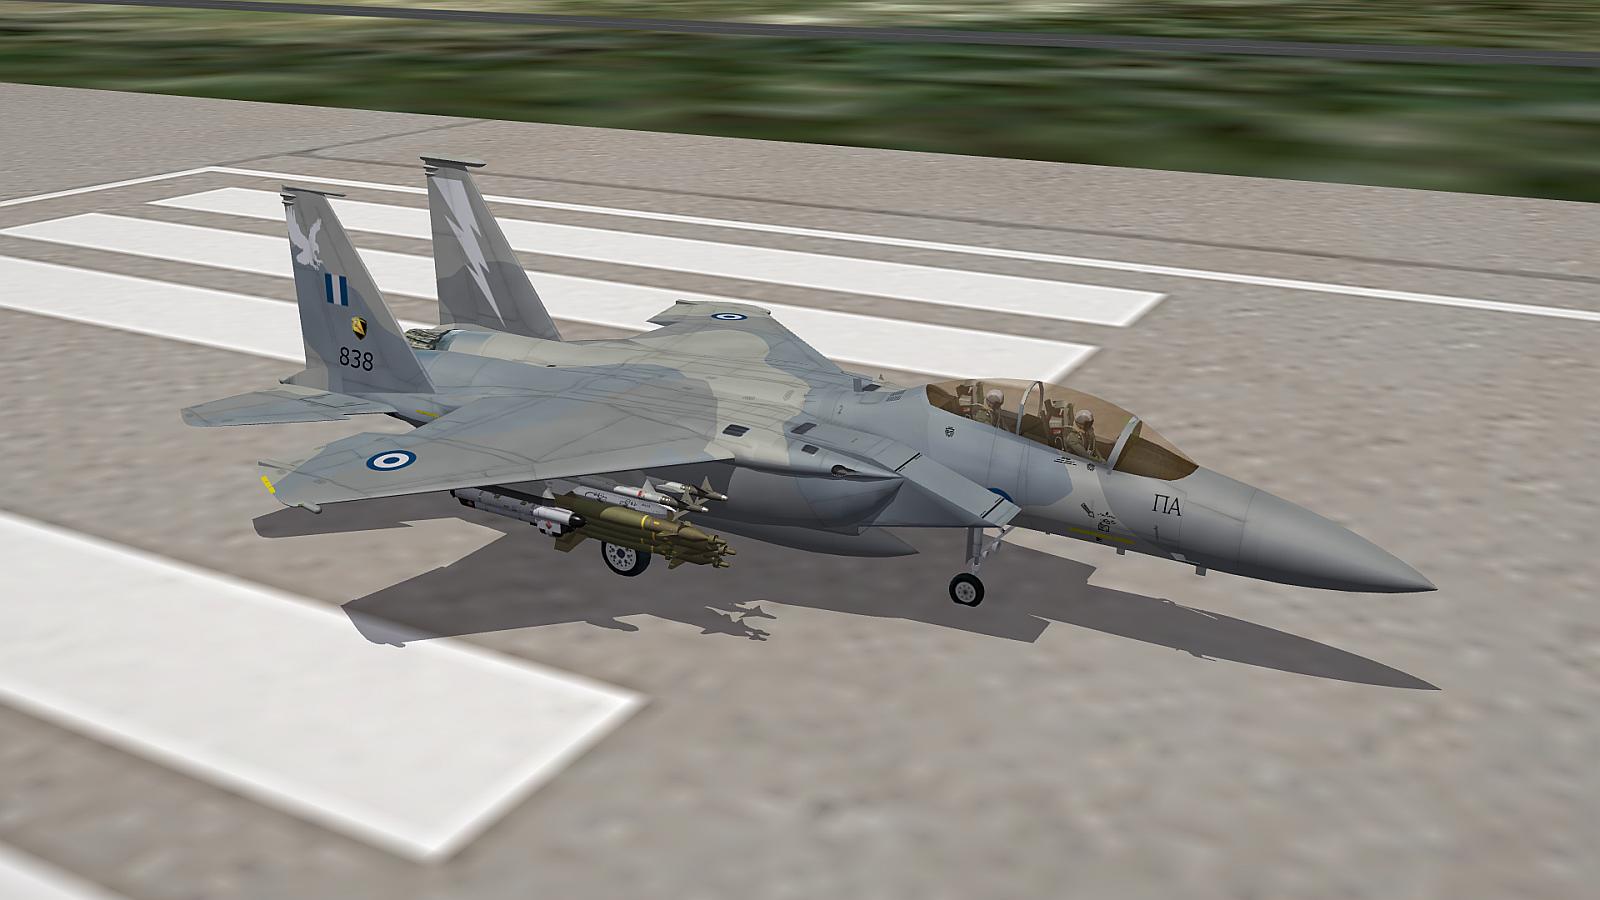 [Fictional] F-15 Eagle Skin Elleniki Aeroporia